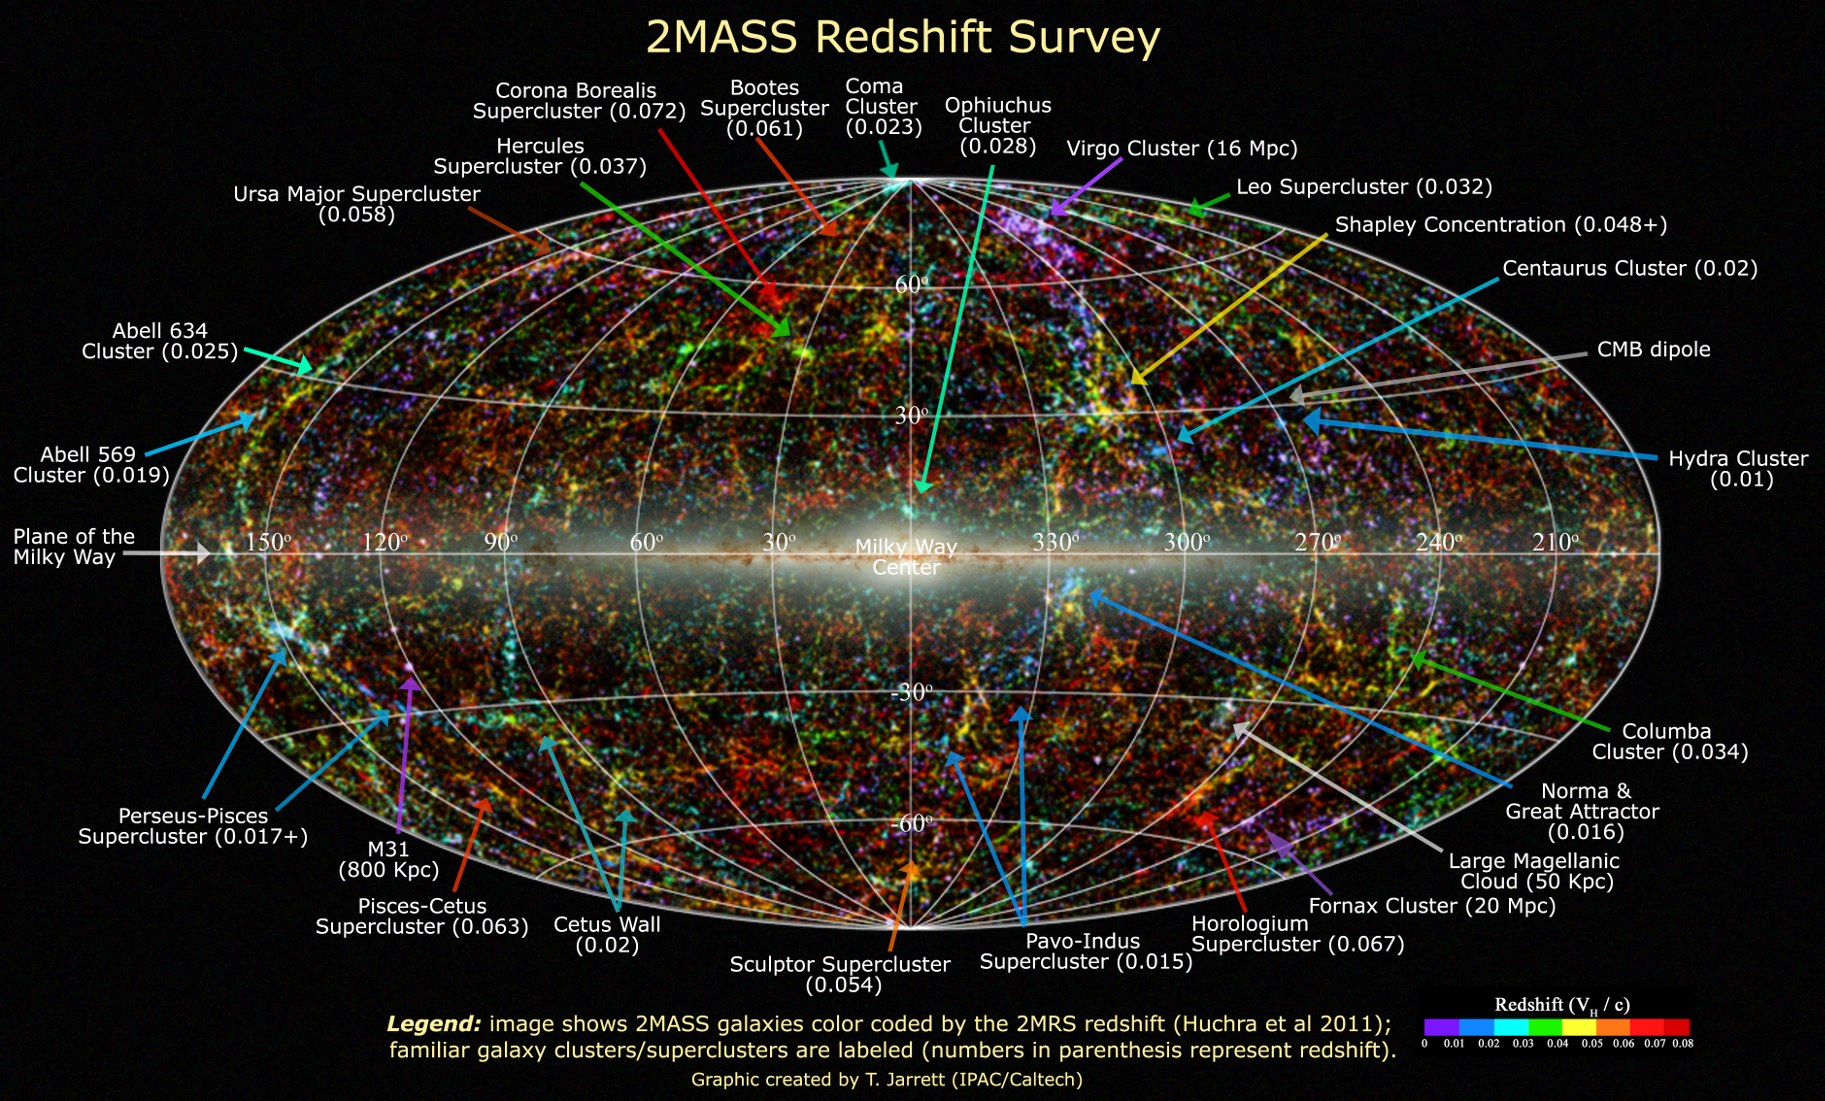 2MASS Redshift Survey location map